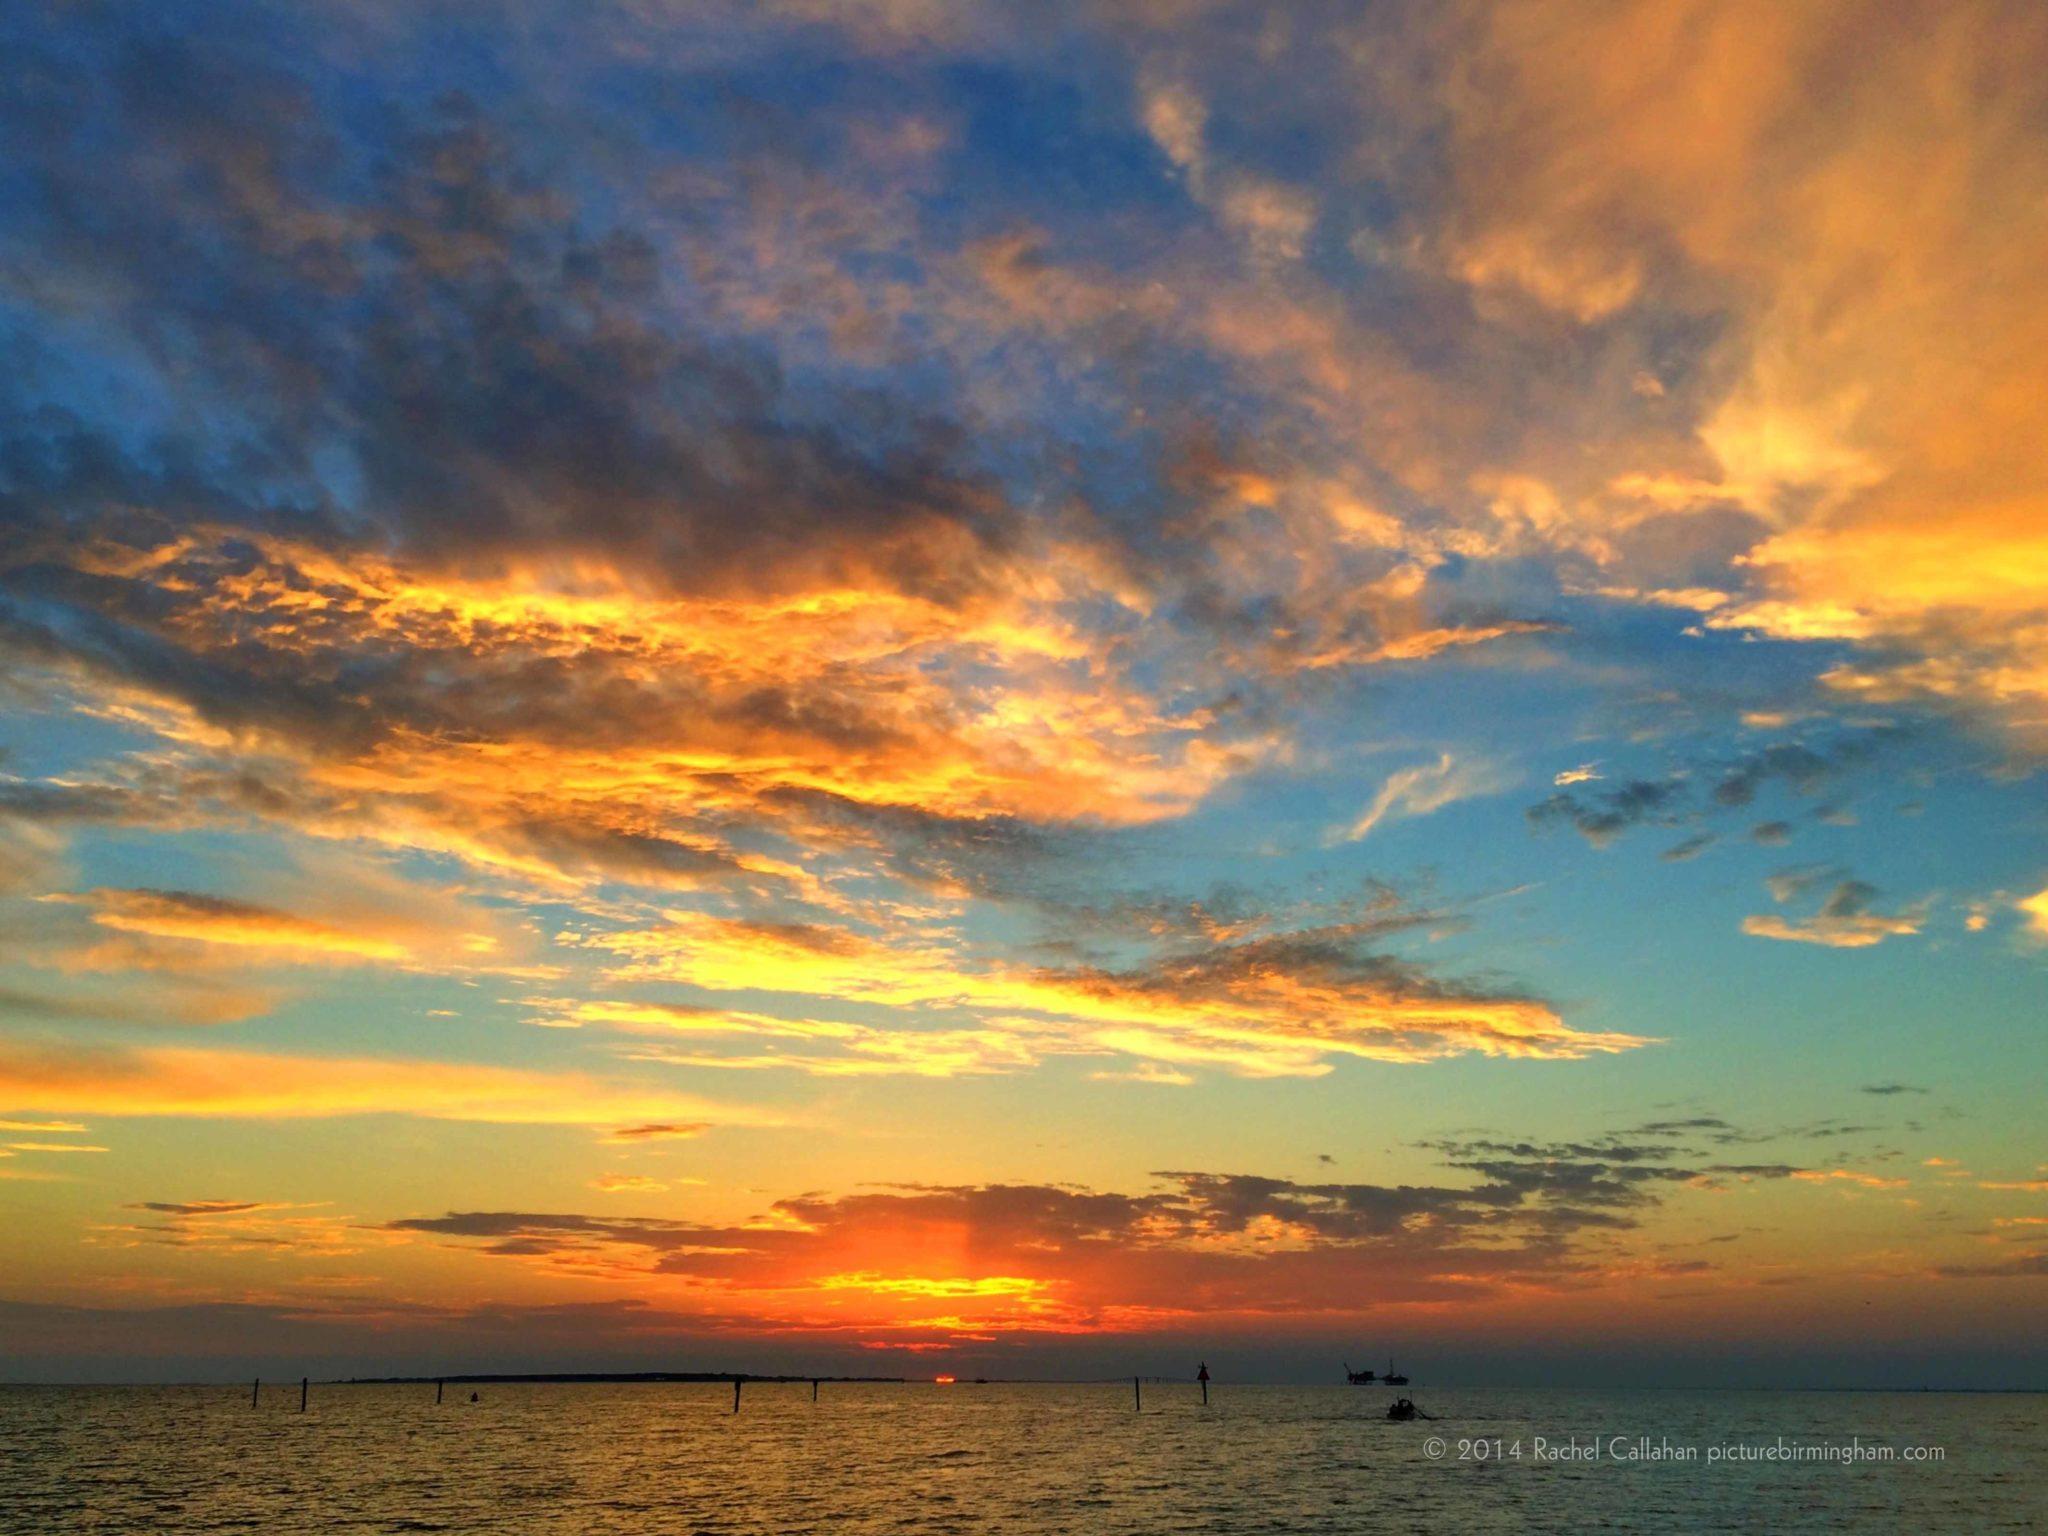 Http Picturebirmingham Com 2014 05 25 52414 The Giant Skies Of Alabama